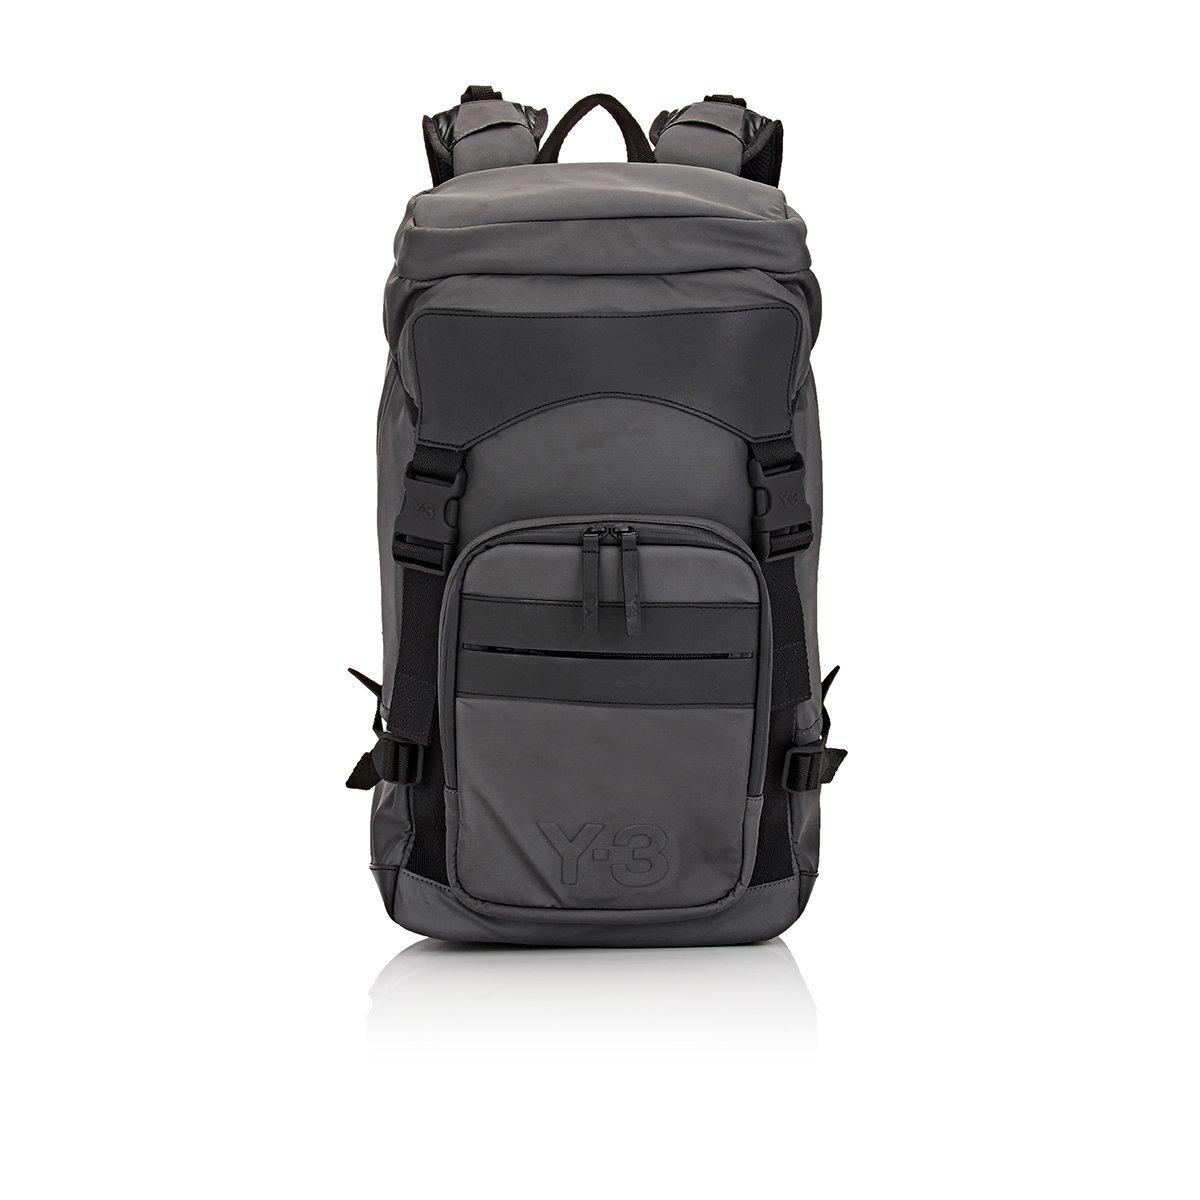 cd51fb243b Y-3 Ultratech Backpack in Gray for Men - Lyst